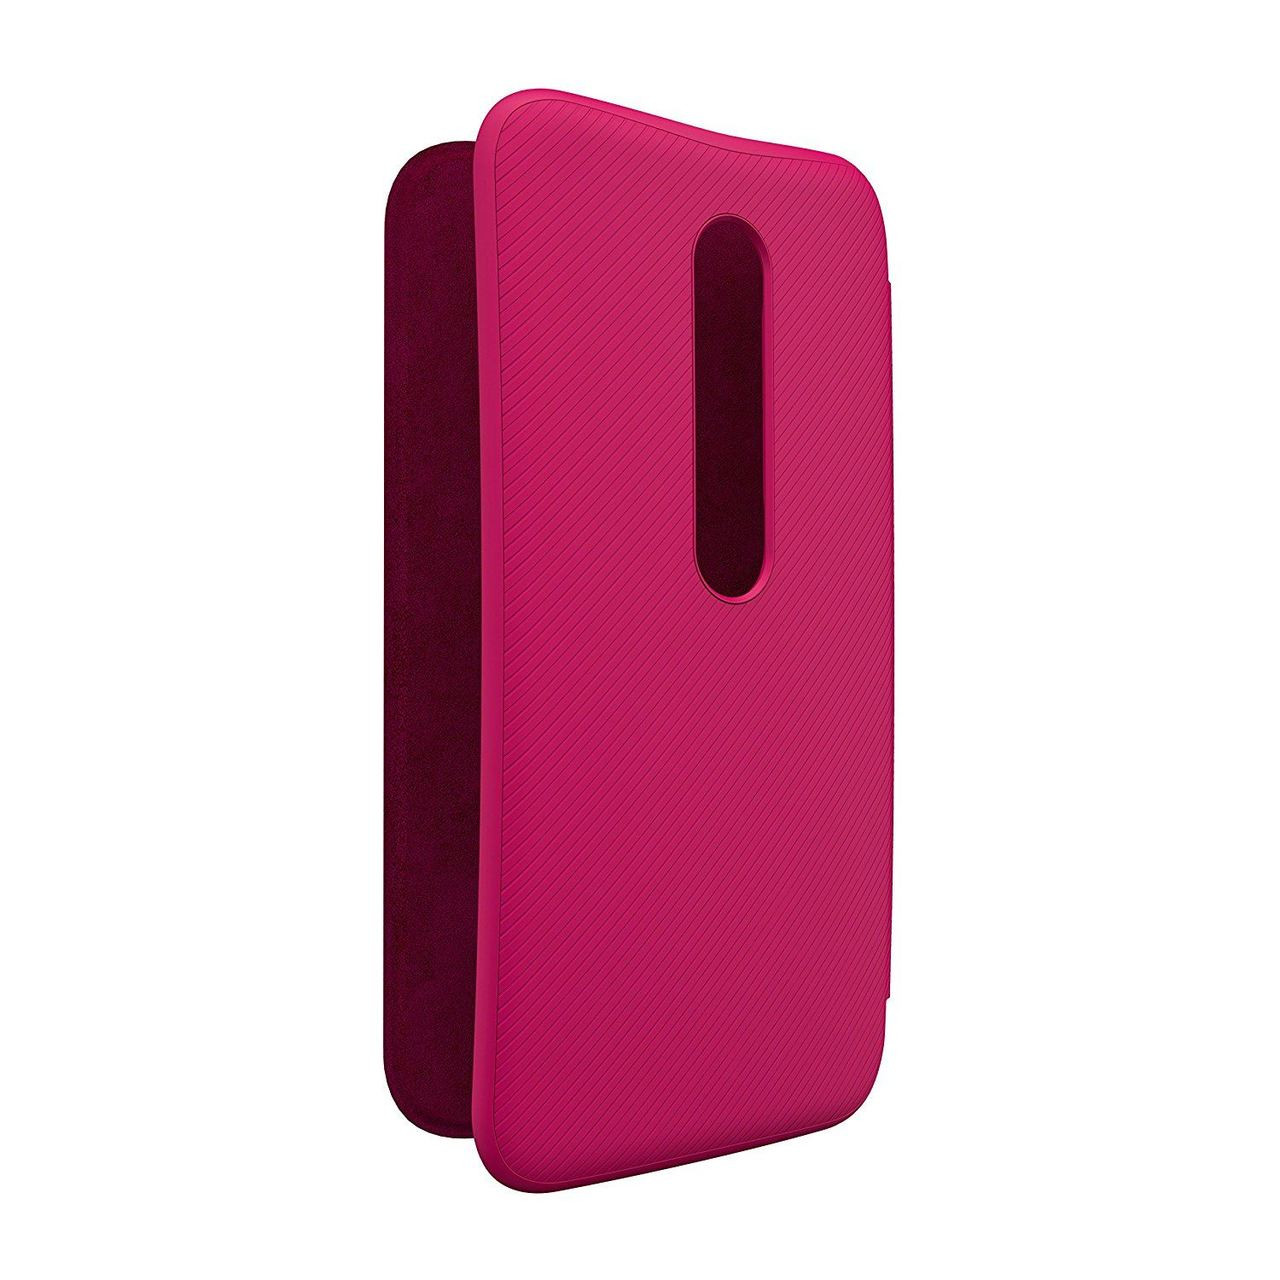 best loved bede1 299de Genuine Official Motorola Original Moto G 3rd Generation Flip Shell -  Raspberry